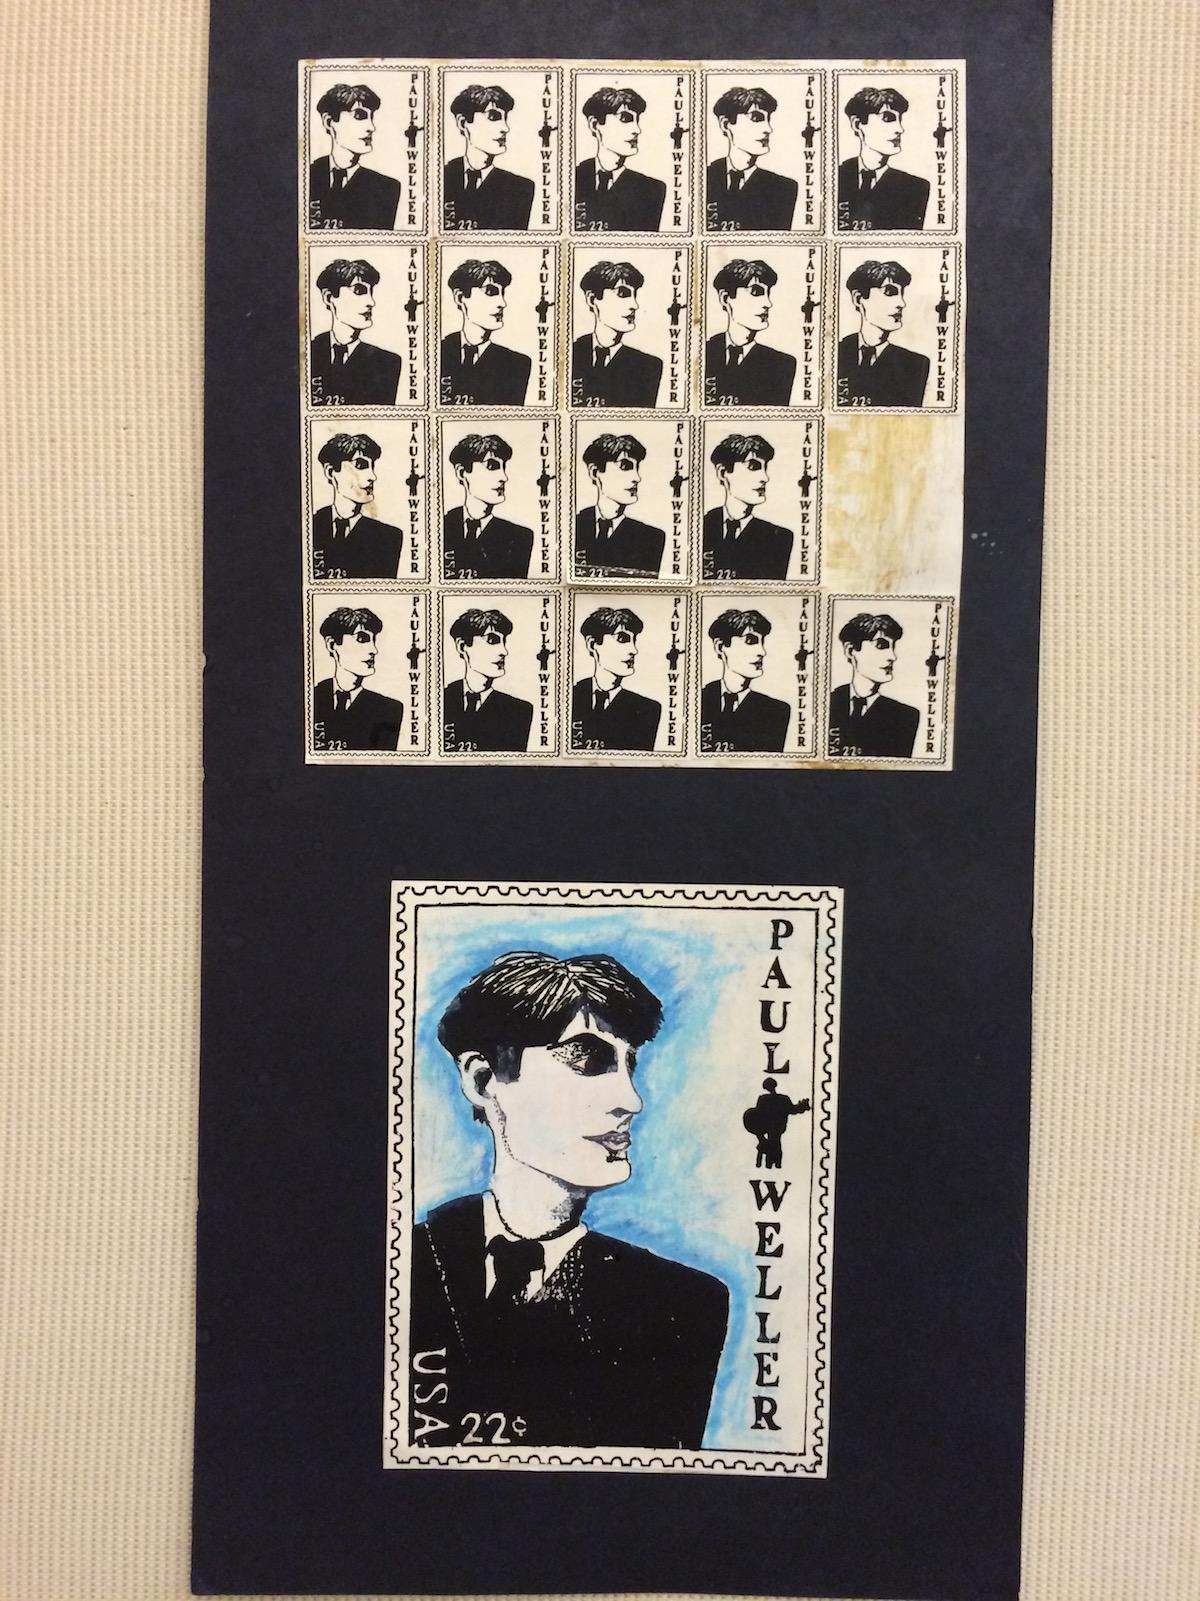 paul weller stamp art